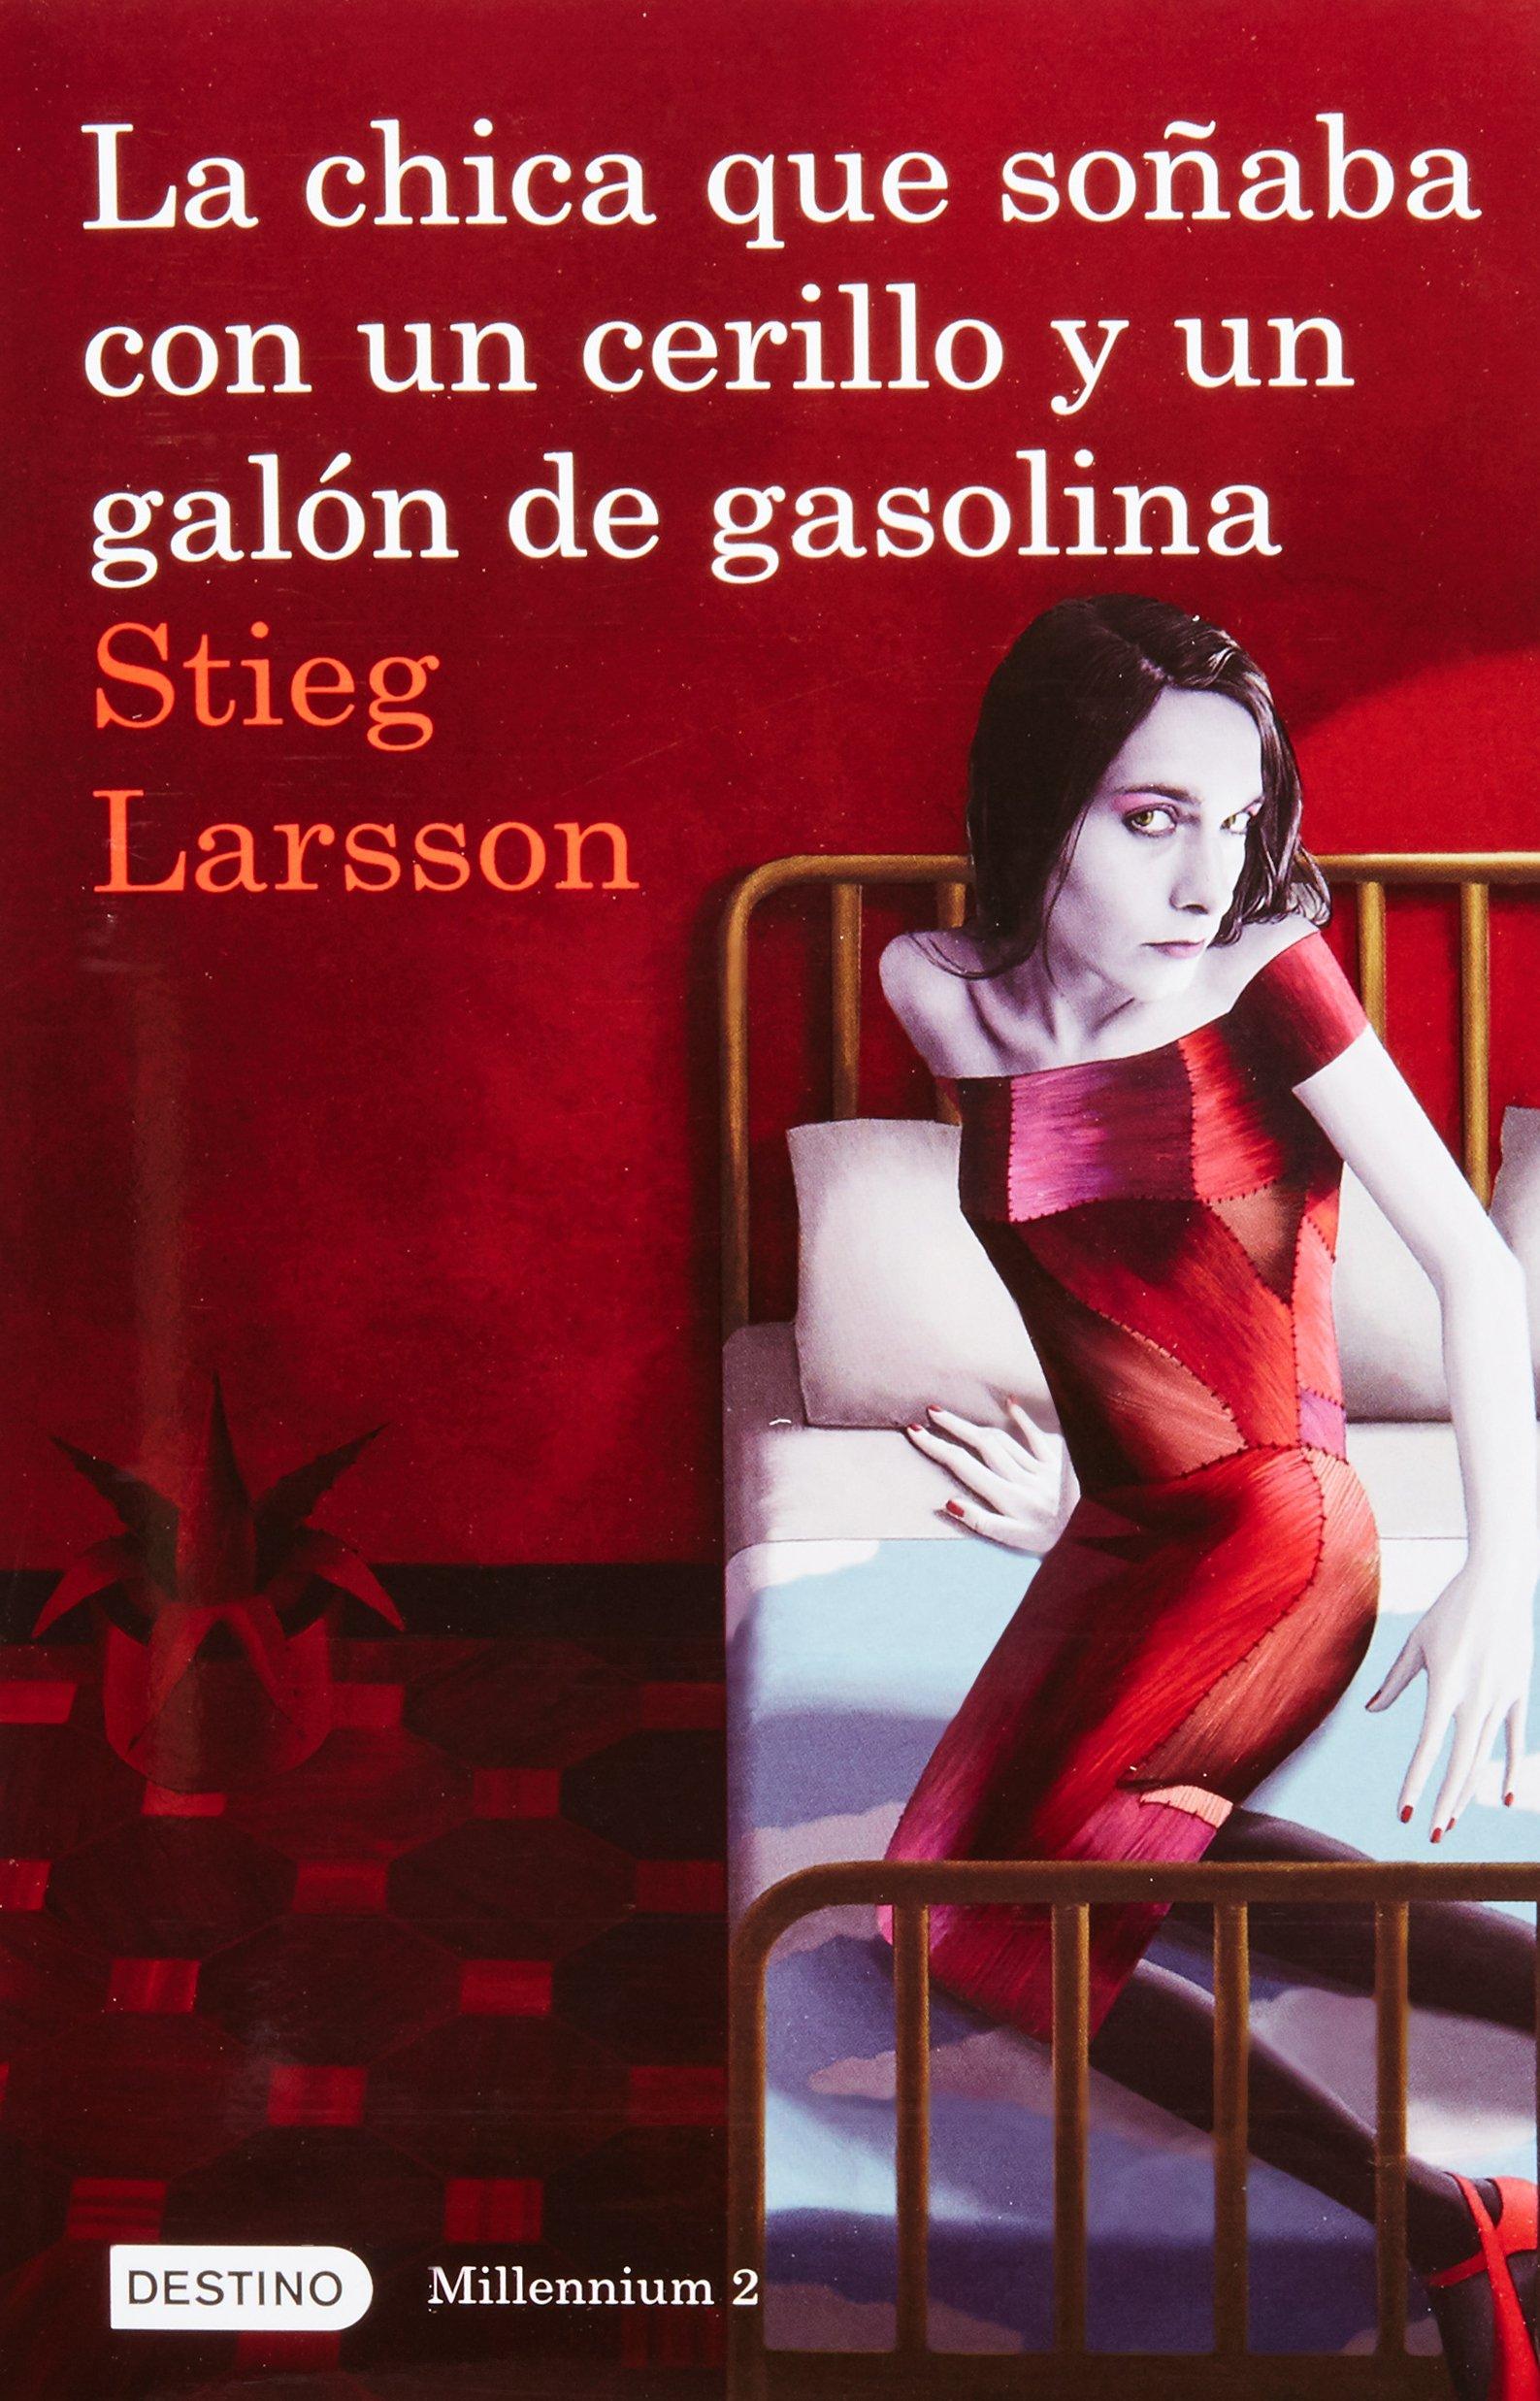 La chica que soñaba con un cerillo y un galon de gasolina: The Girl Who Played with Fire (Millenium) (Spanish Edition) PDF